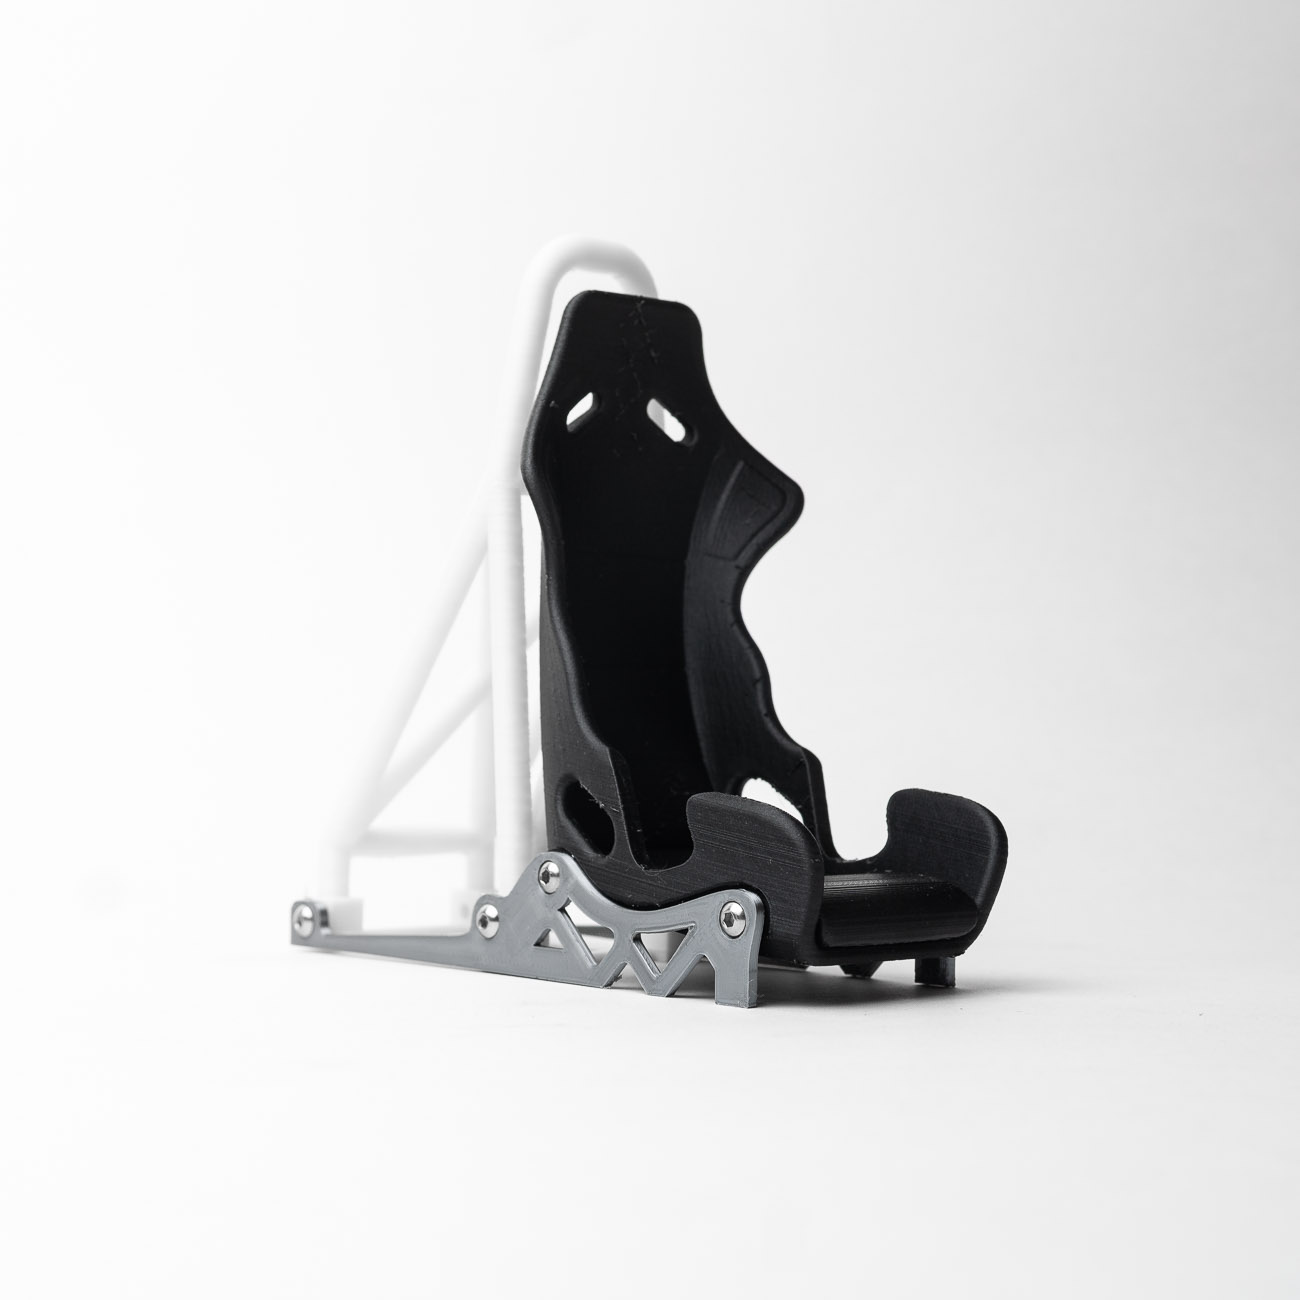 Racing Seat Phone Holder